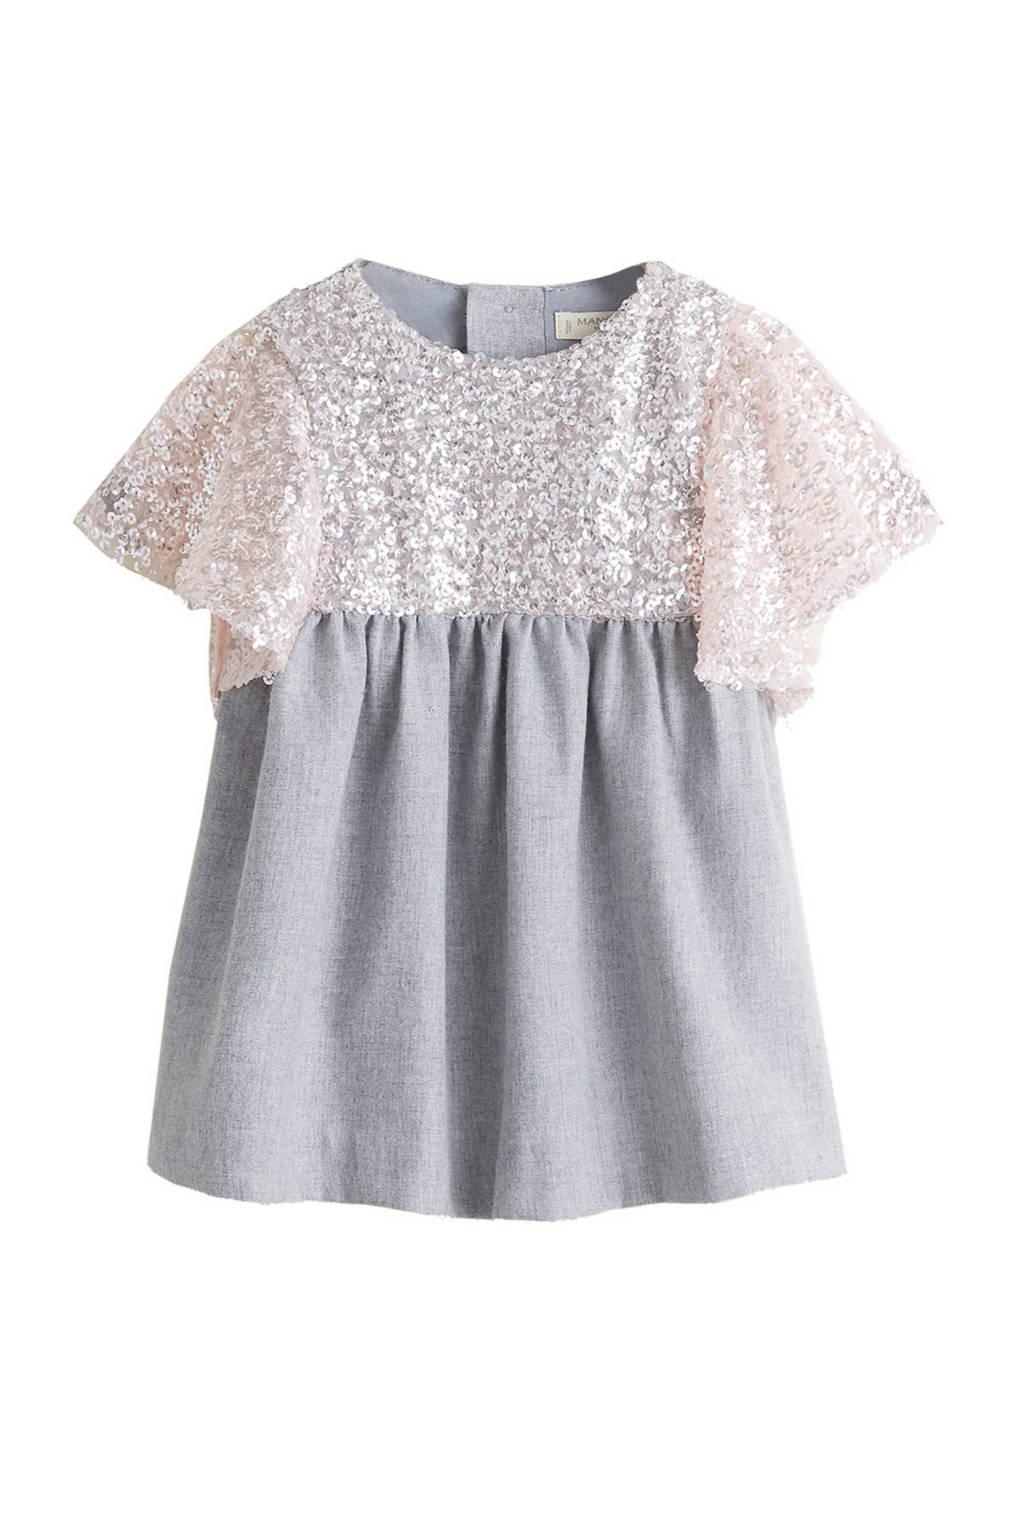 7b982829f32daa Mango Kids jurk met pailletten grijs offwhite